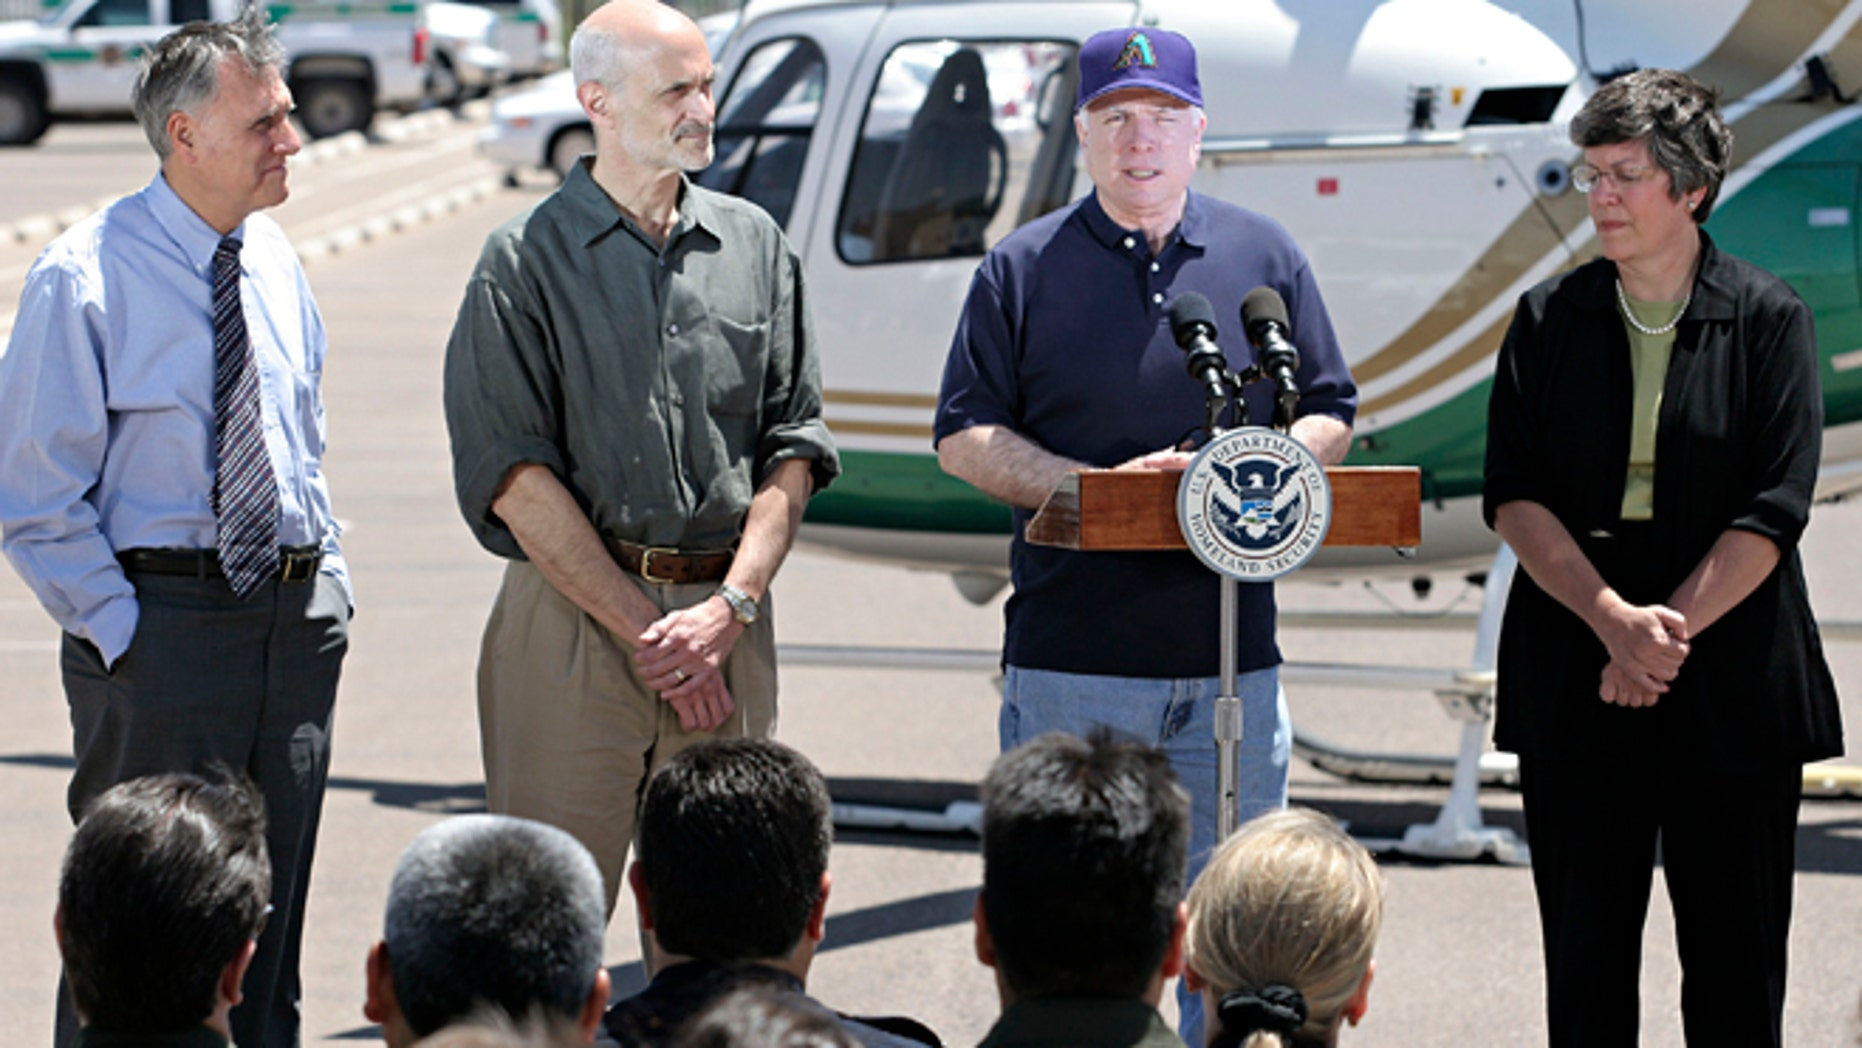 DOUGLAS, AZ - MAY 5:  U.S. Senator John McCain (R-AZ.) (Center-R) introduces U.S. Secretary of Homeland Security Michael Chertoff (Center-L) at the U.S. Border Patrol Station May 5, 2005 in Douglas, Arizona. Chertoff toured the border at Douglas and Yuma, Arizona and U.S. Border Patrol facilities along with U.S. Senator John McCain (R-AZ.), U.S. Senator Jon Kyl (R-AZ.) and Arizona Governor Janet Napolitano.  (Photo by Jeff Topping/Getty Images)